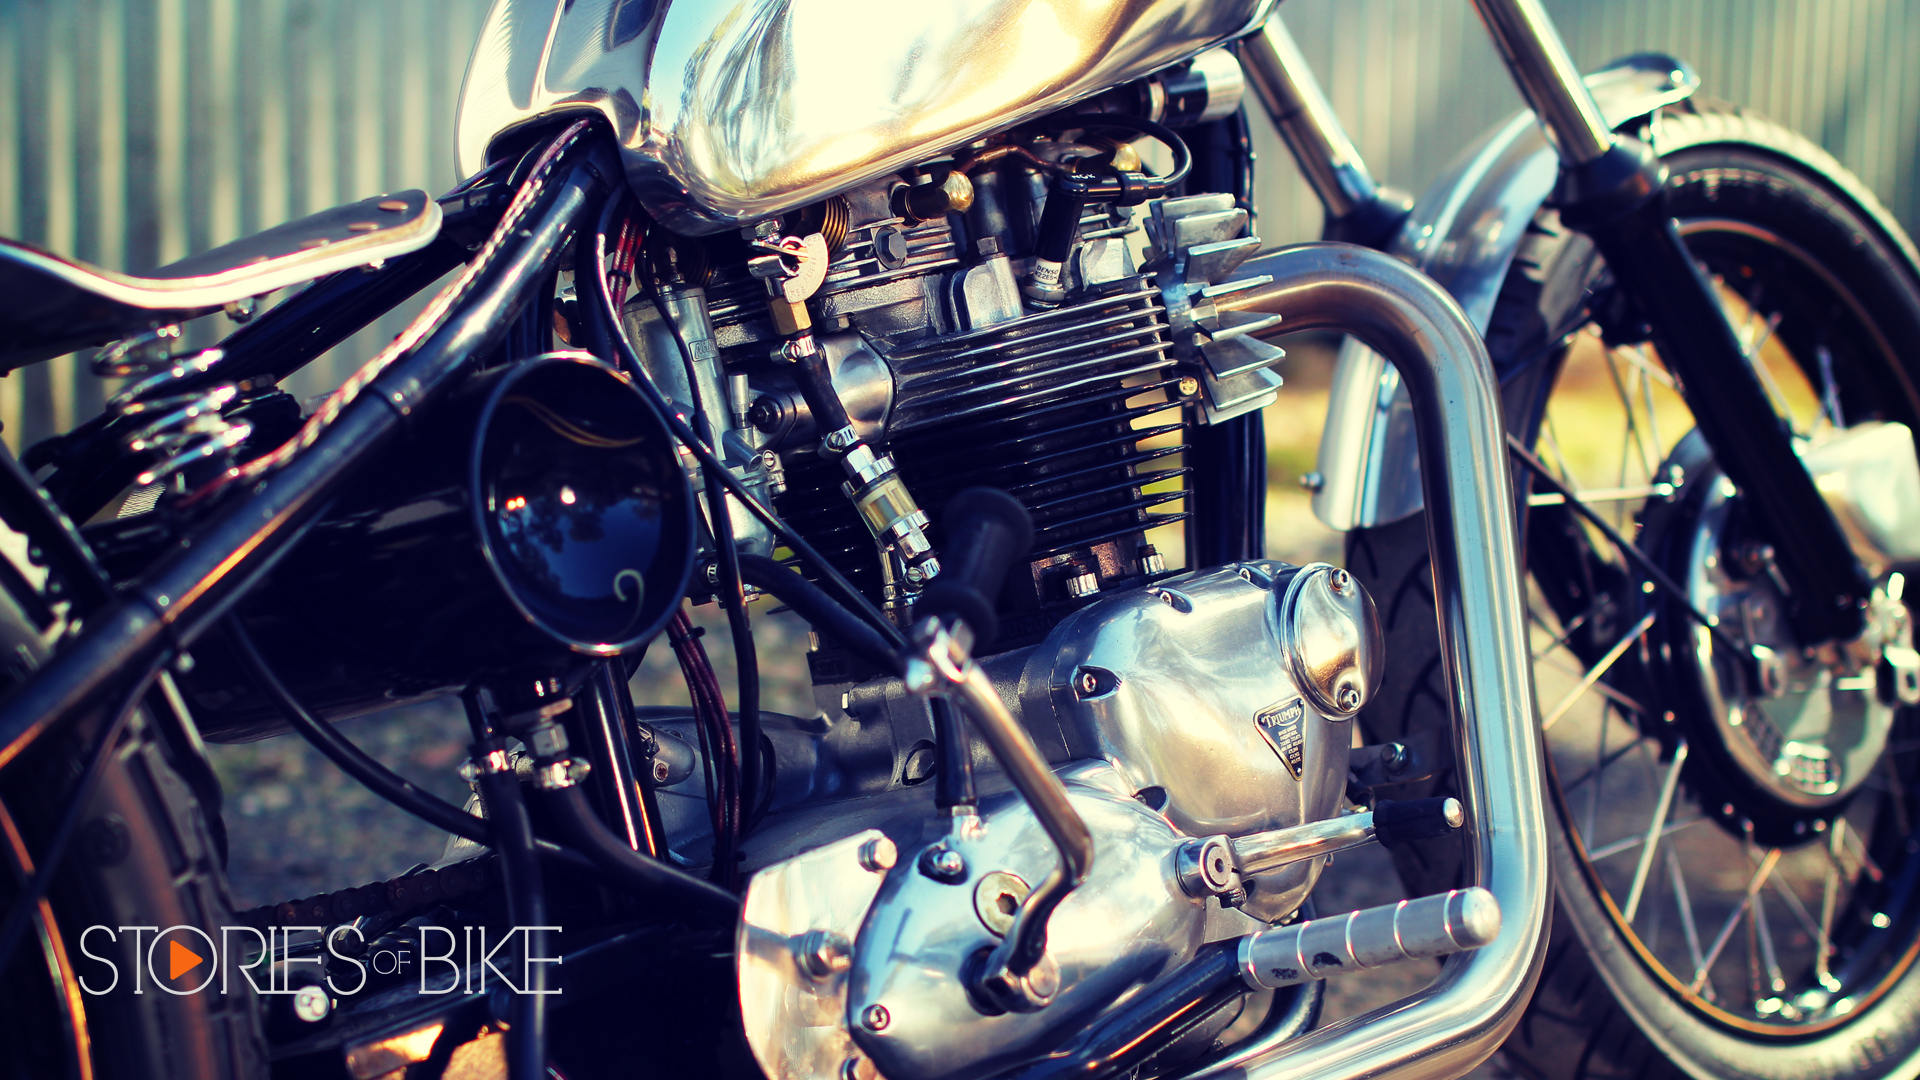 Stories_of_Bike_Publicity_Ep7_8.jpg